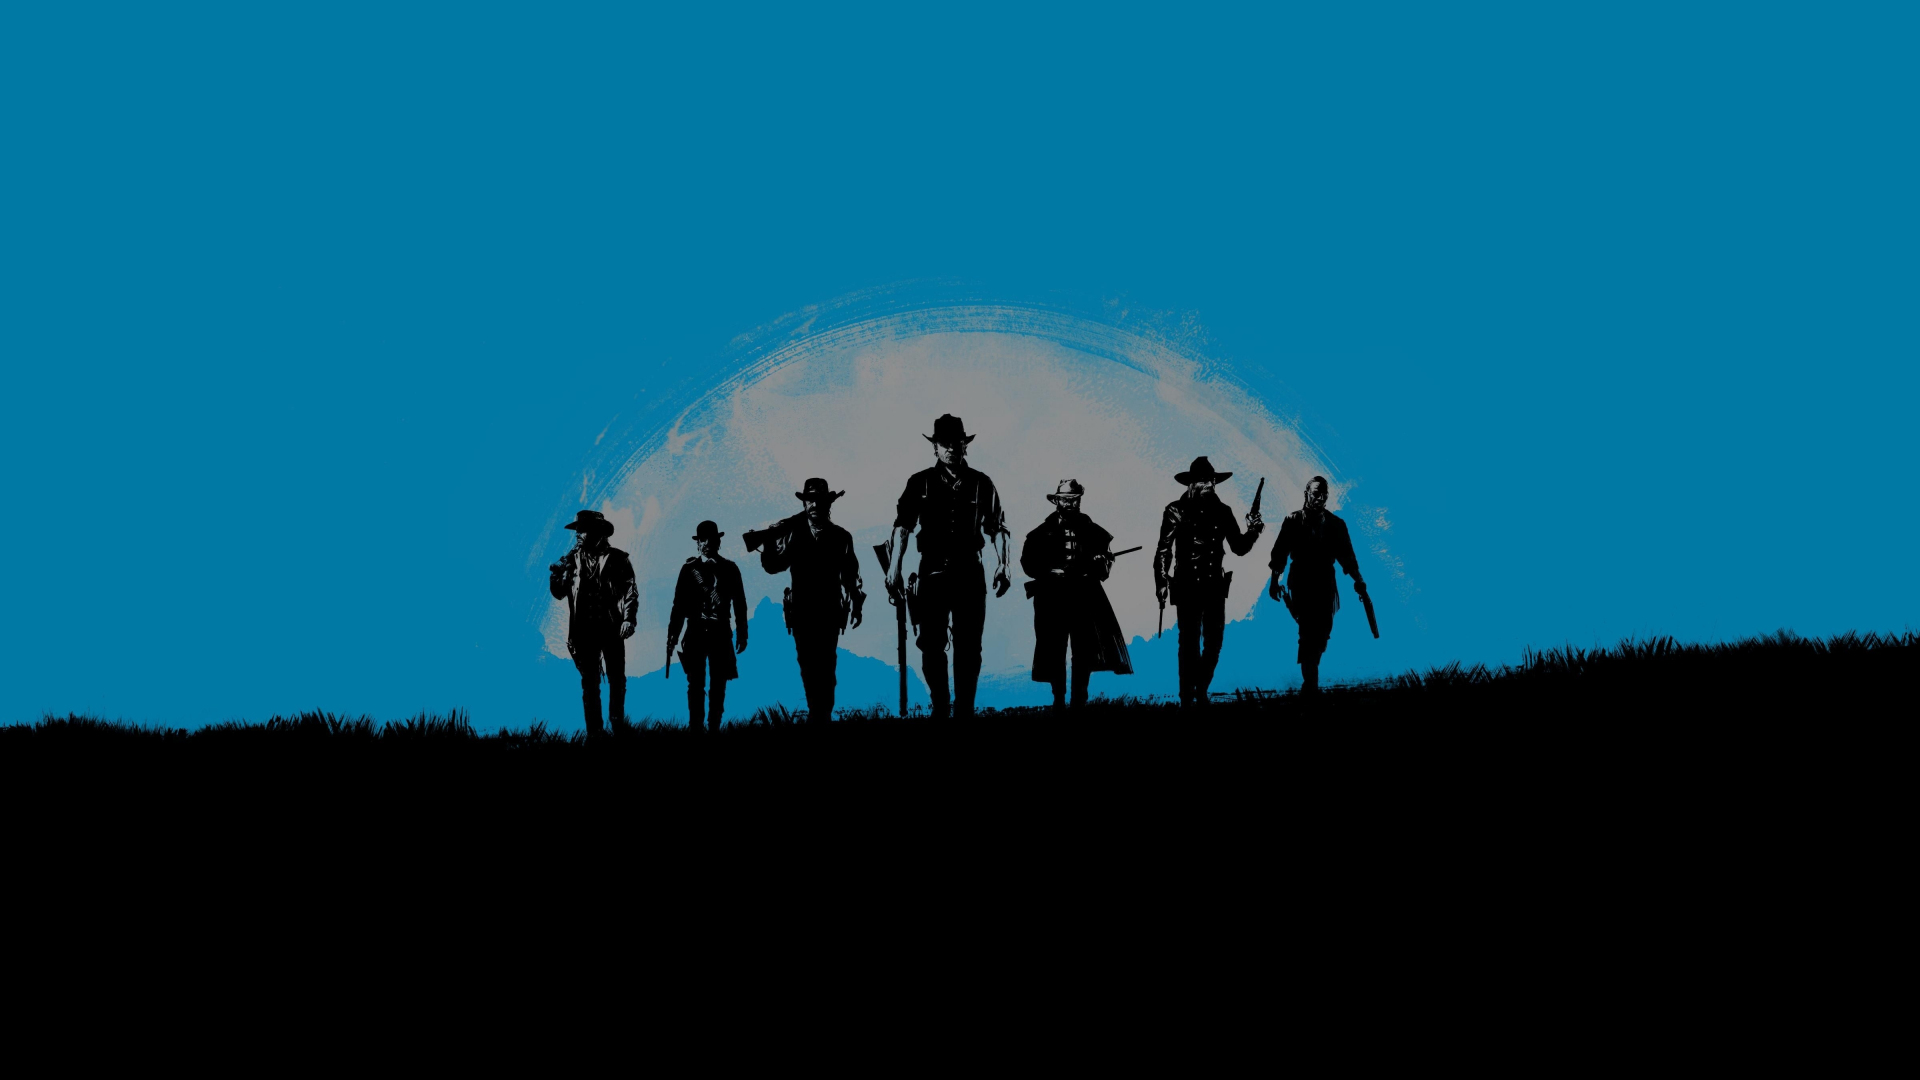 Download 1920x1080 Wallpaper Red Dead Redemption 2 Blue Poster